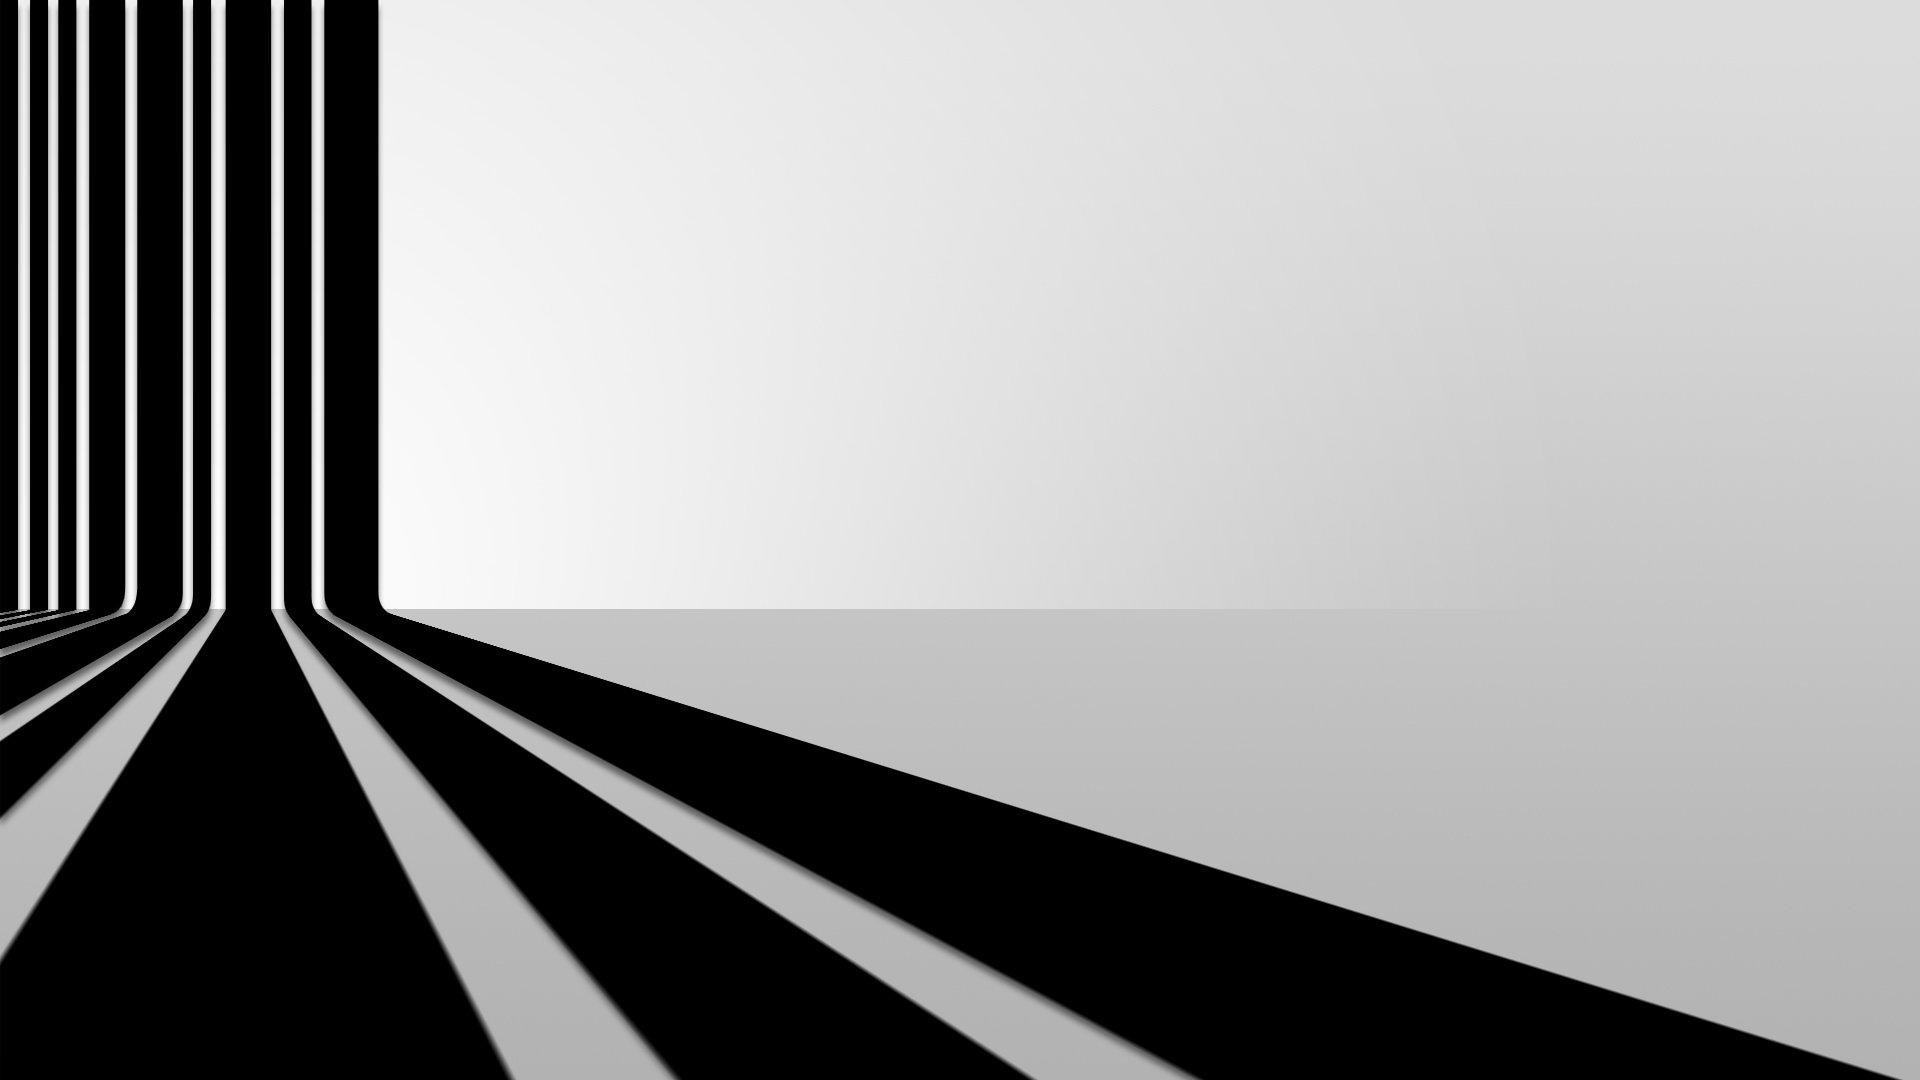 Black and White Wallpaper   Best HD Wallpaper 1920x1080